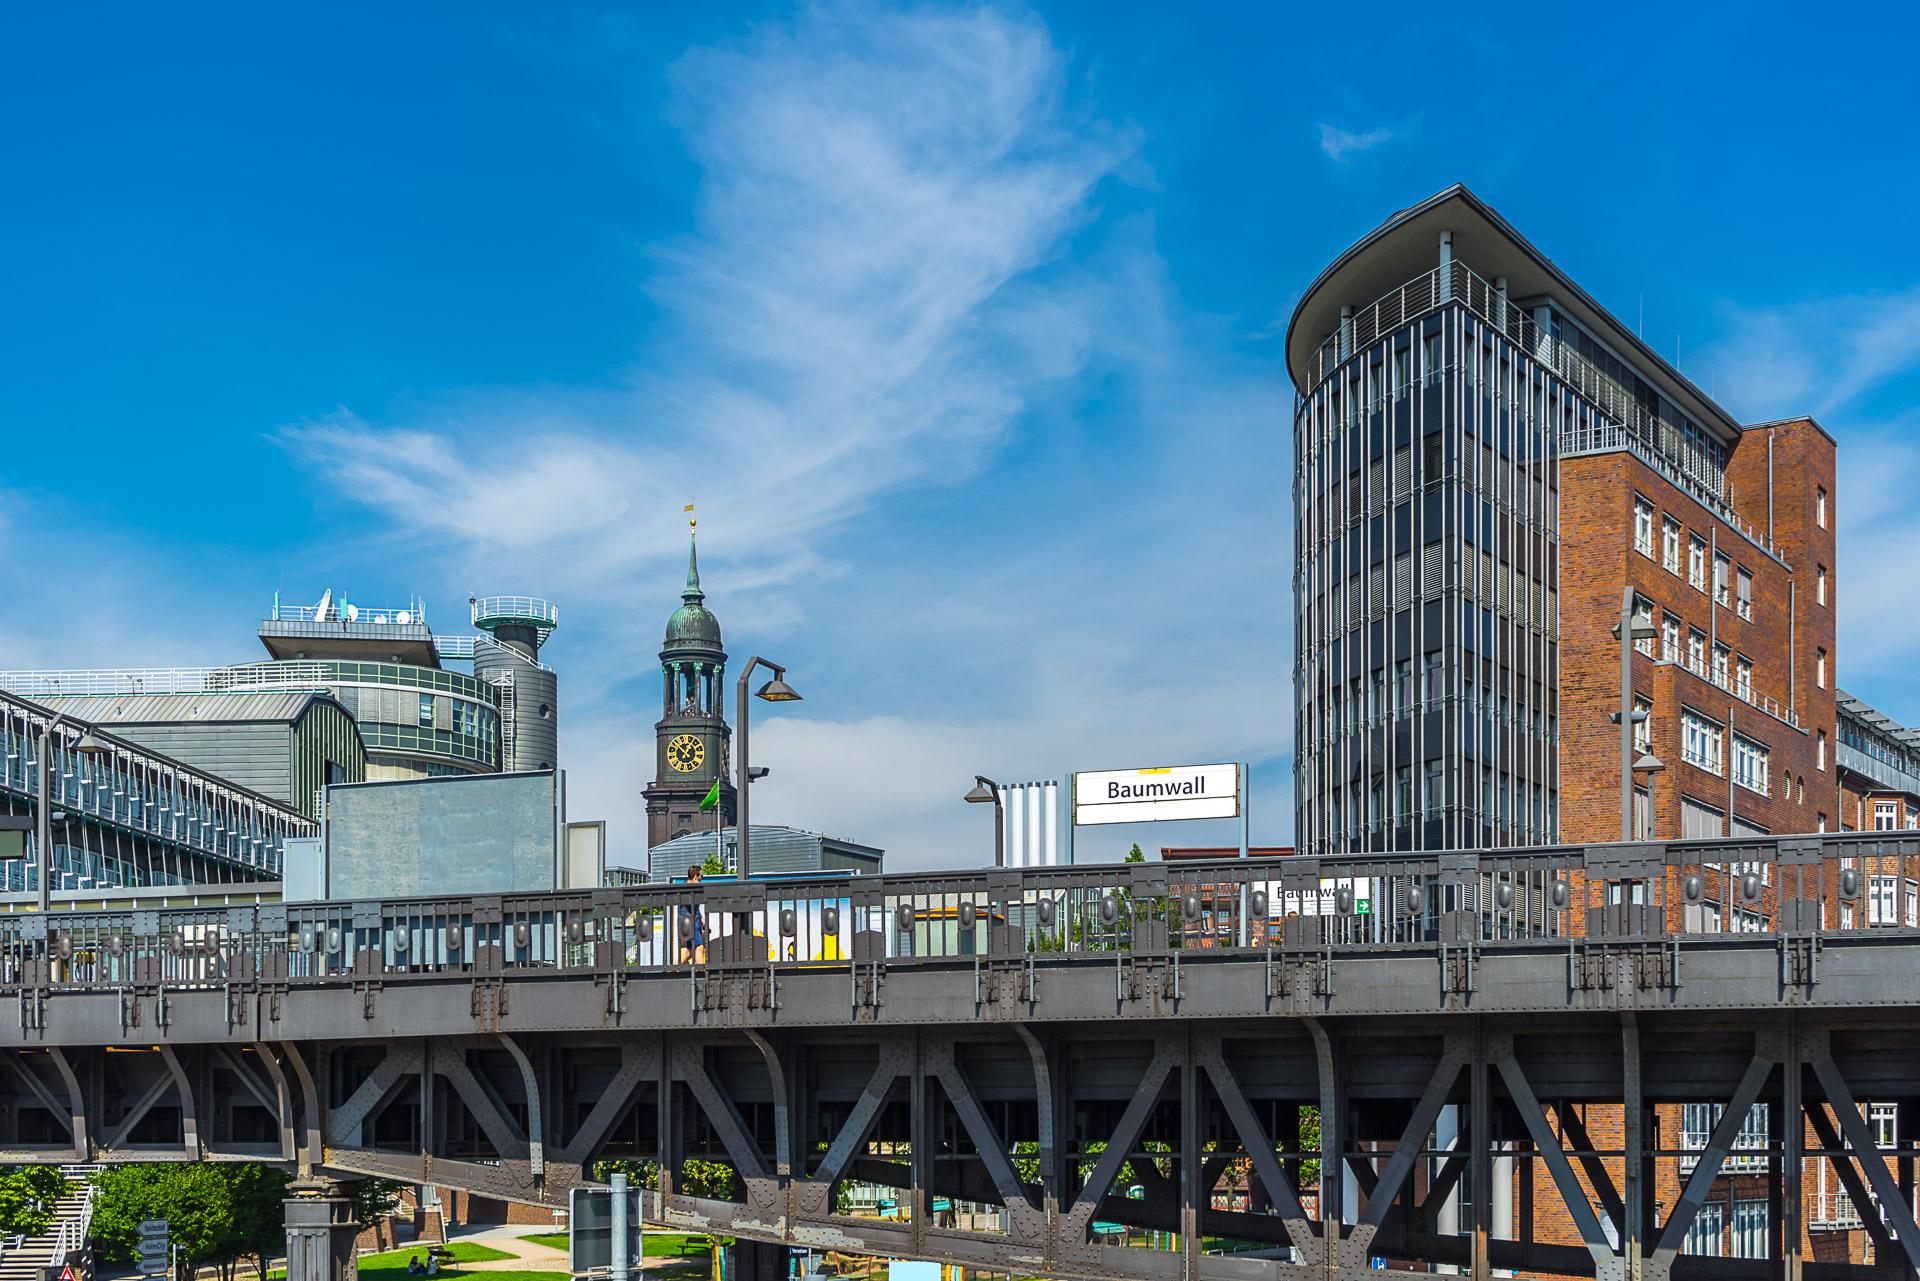 Hamburg Baumwall